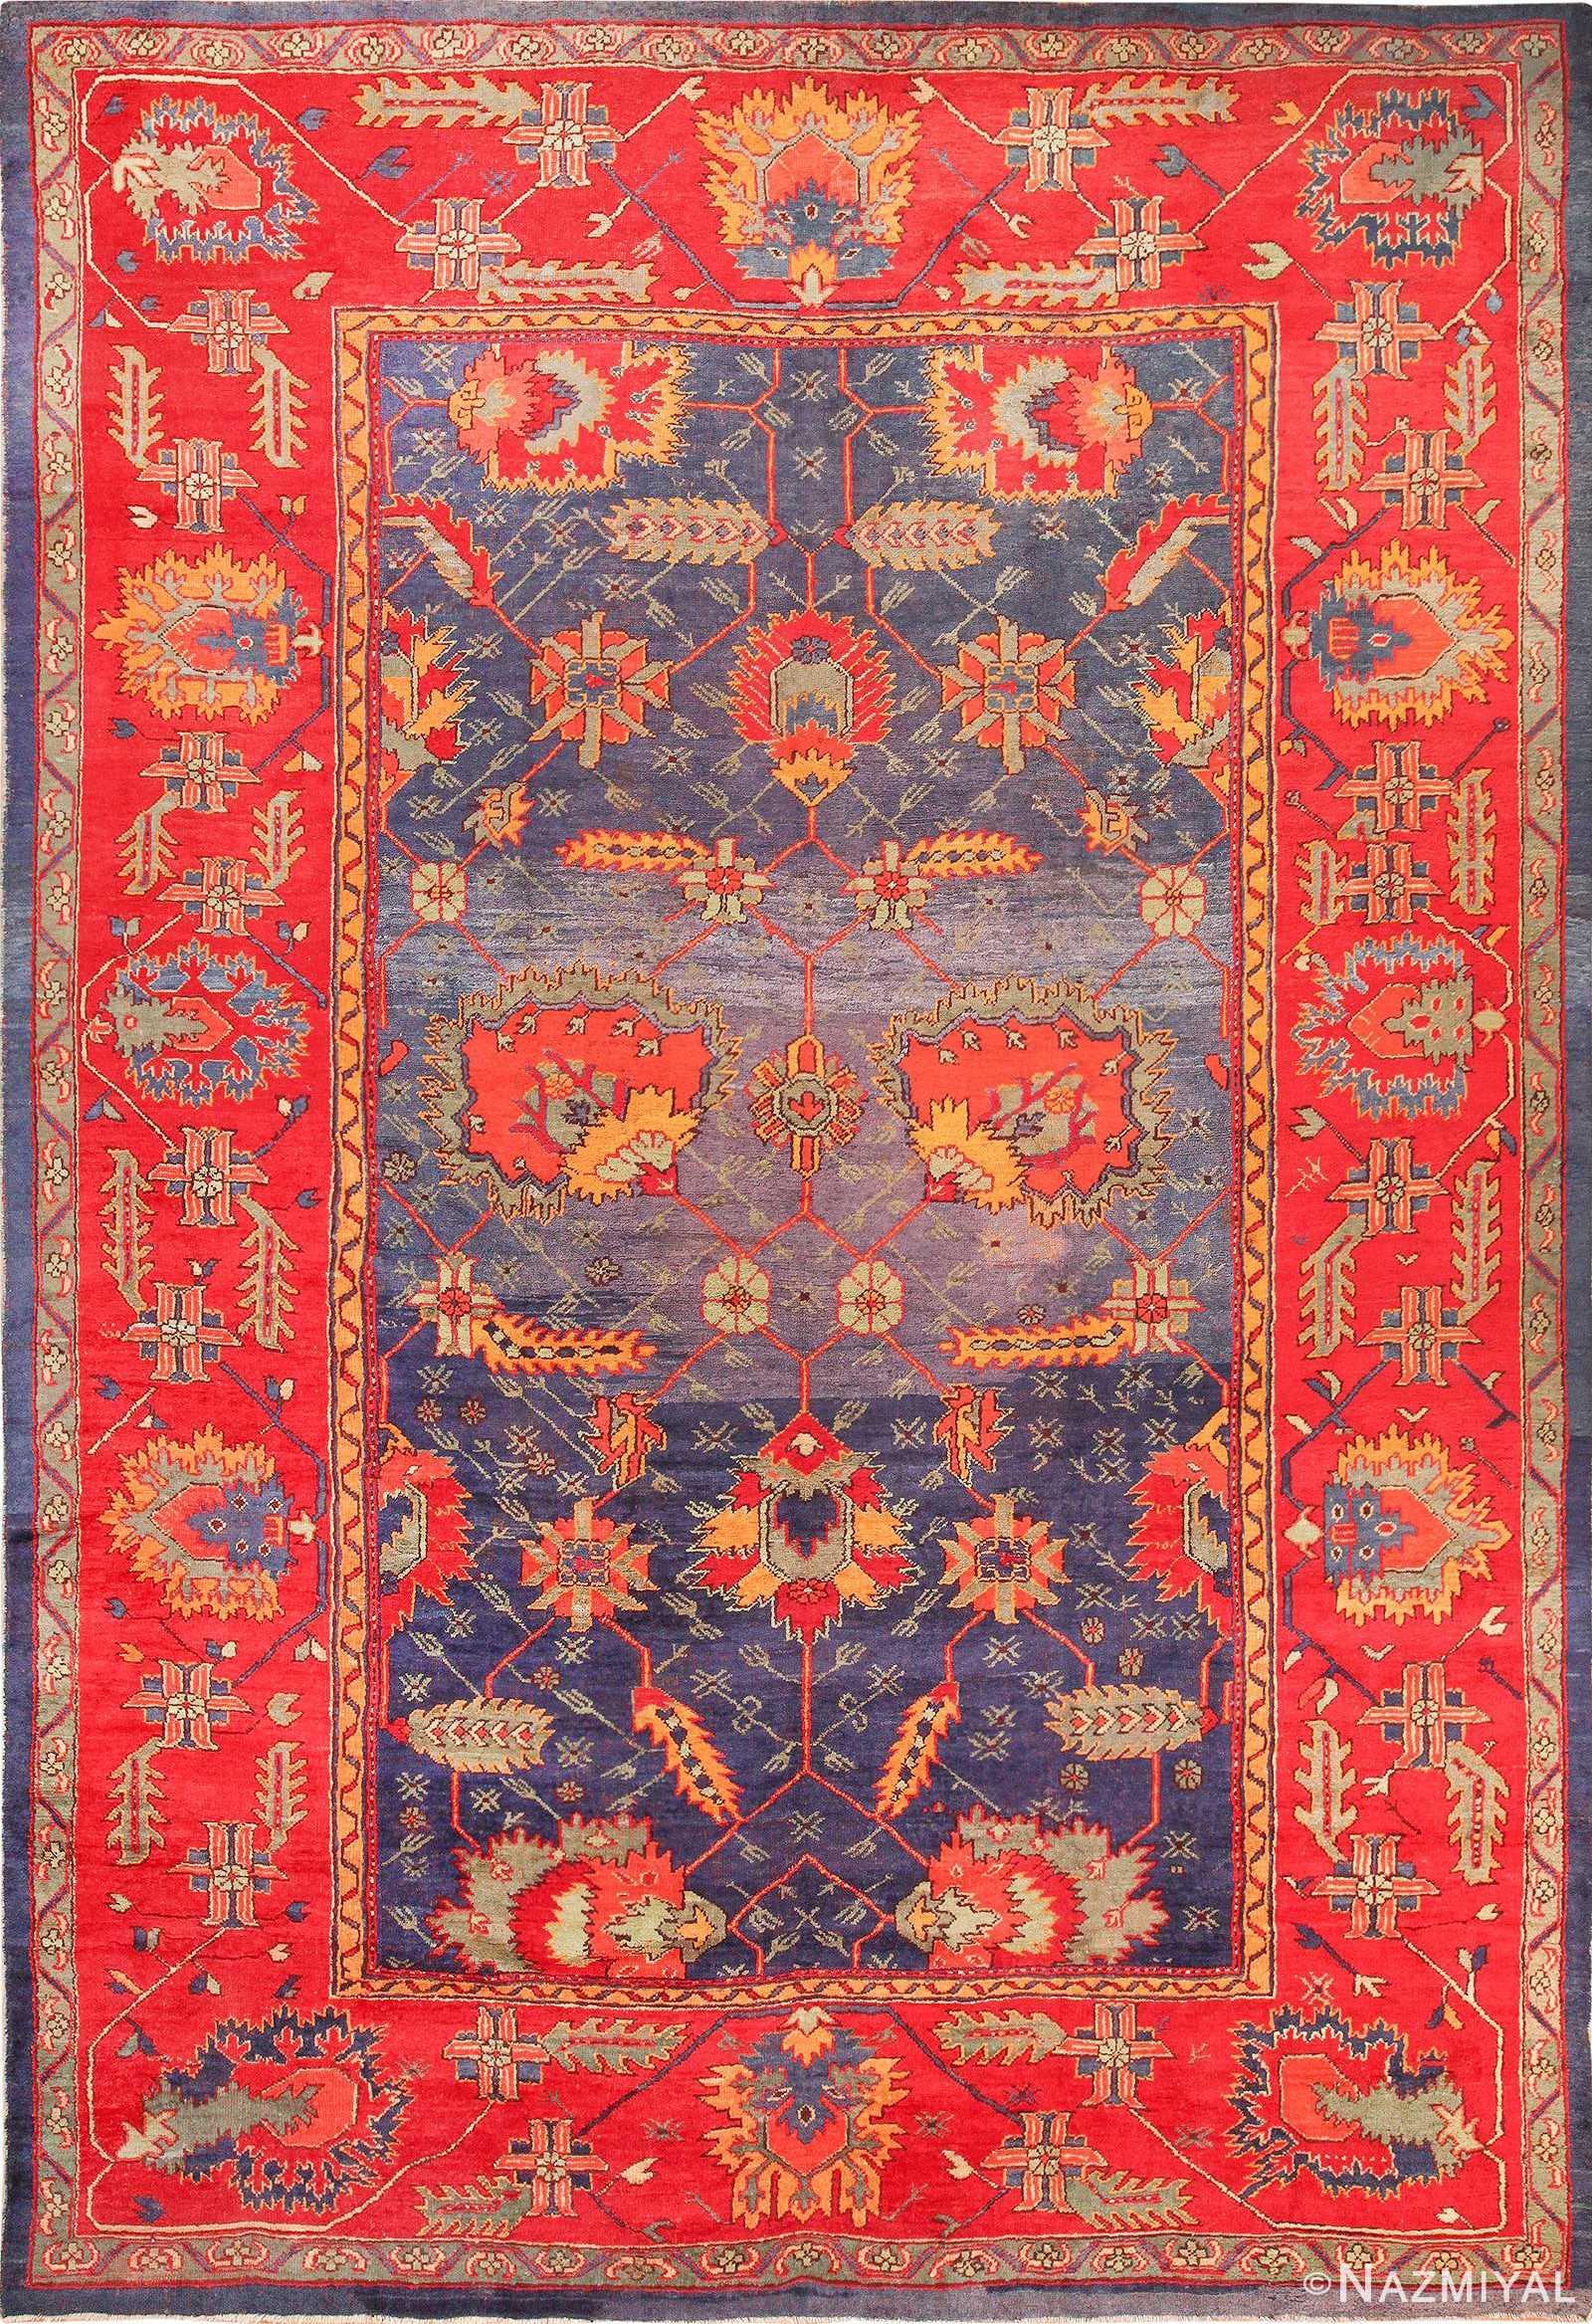 Antique Arts and Crafts Turkish Oushak Rug 49596 by Namziyal